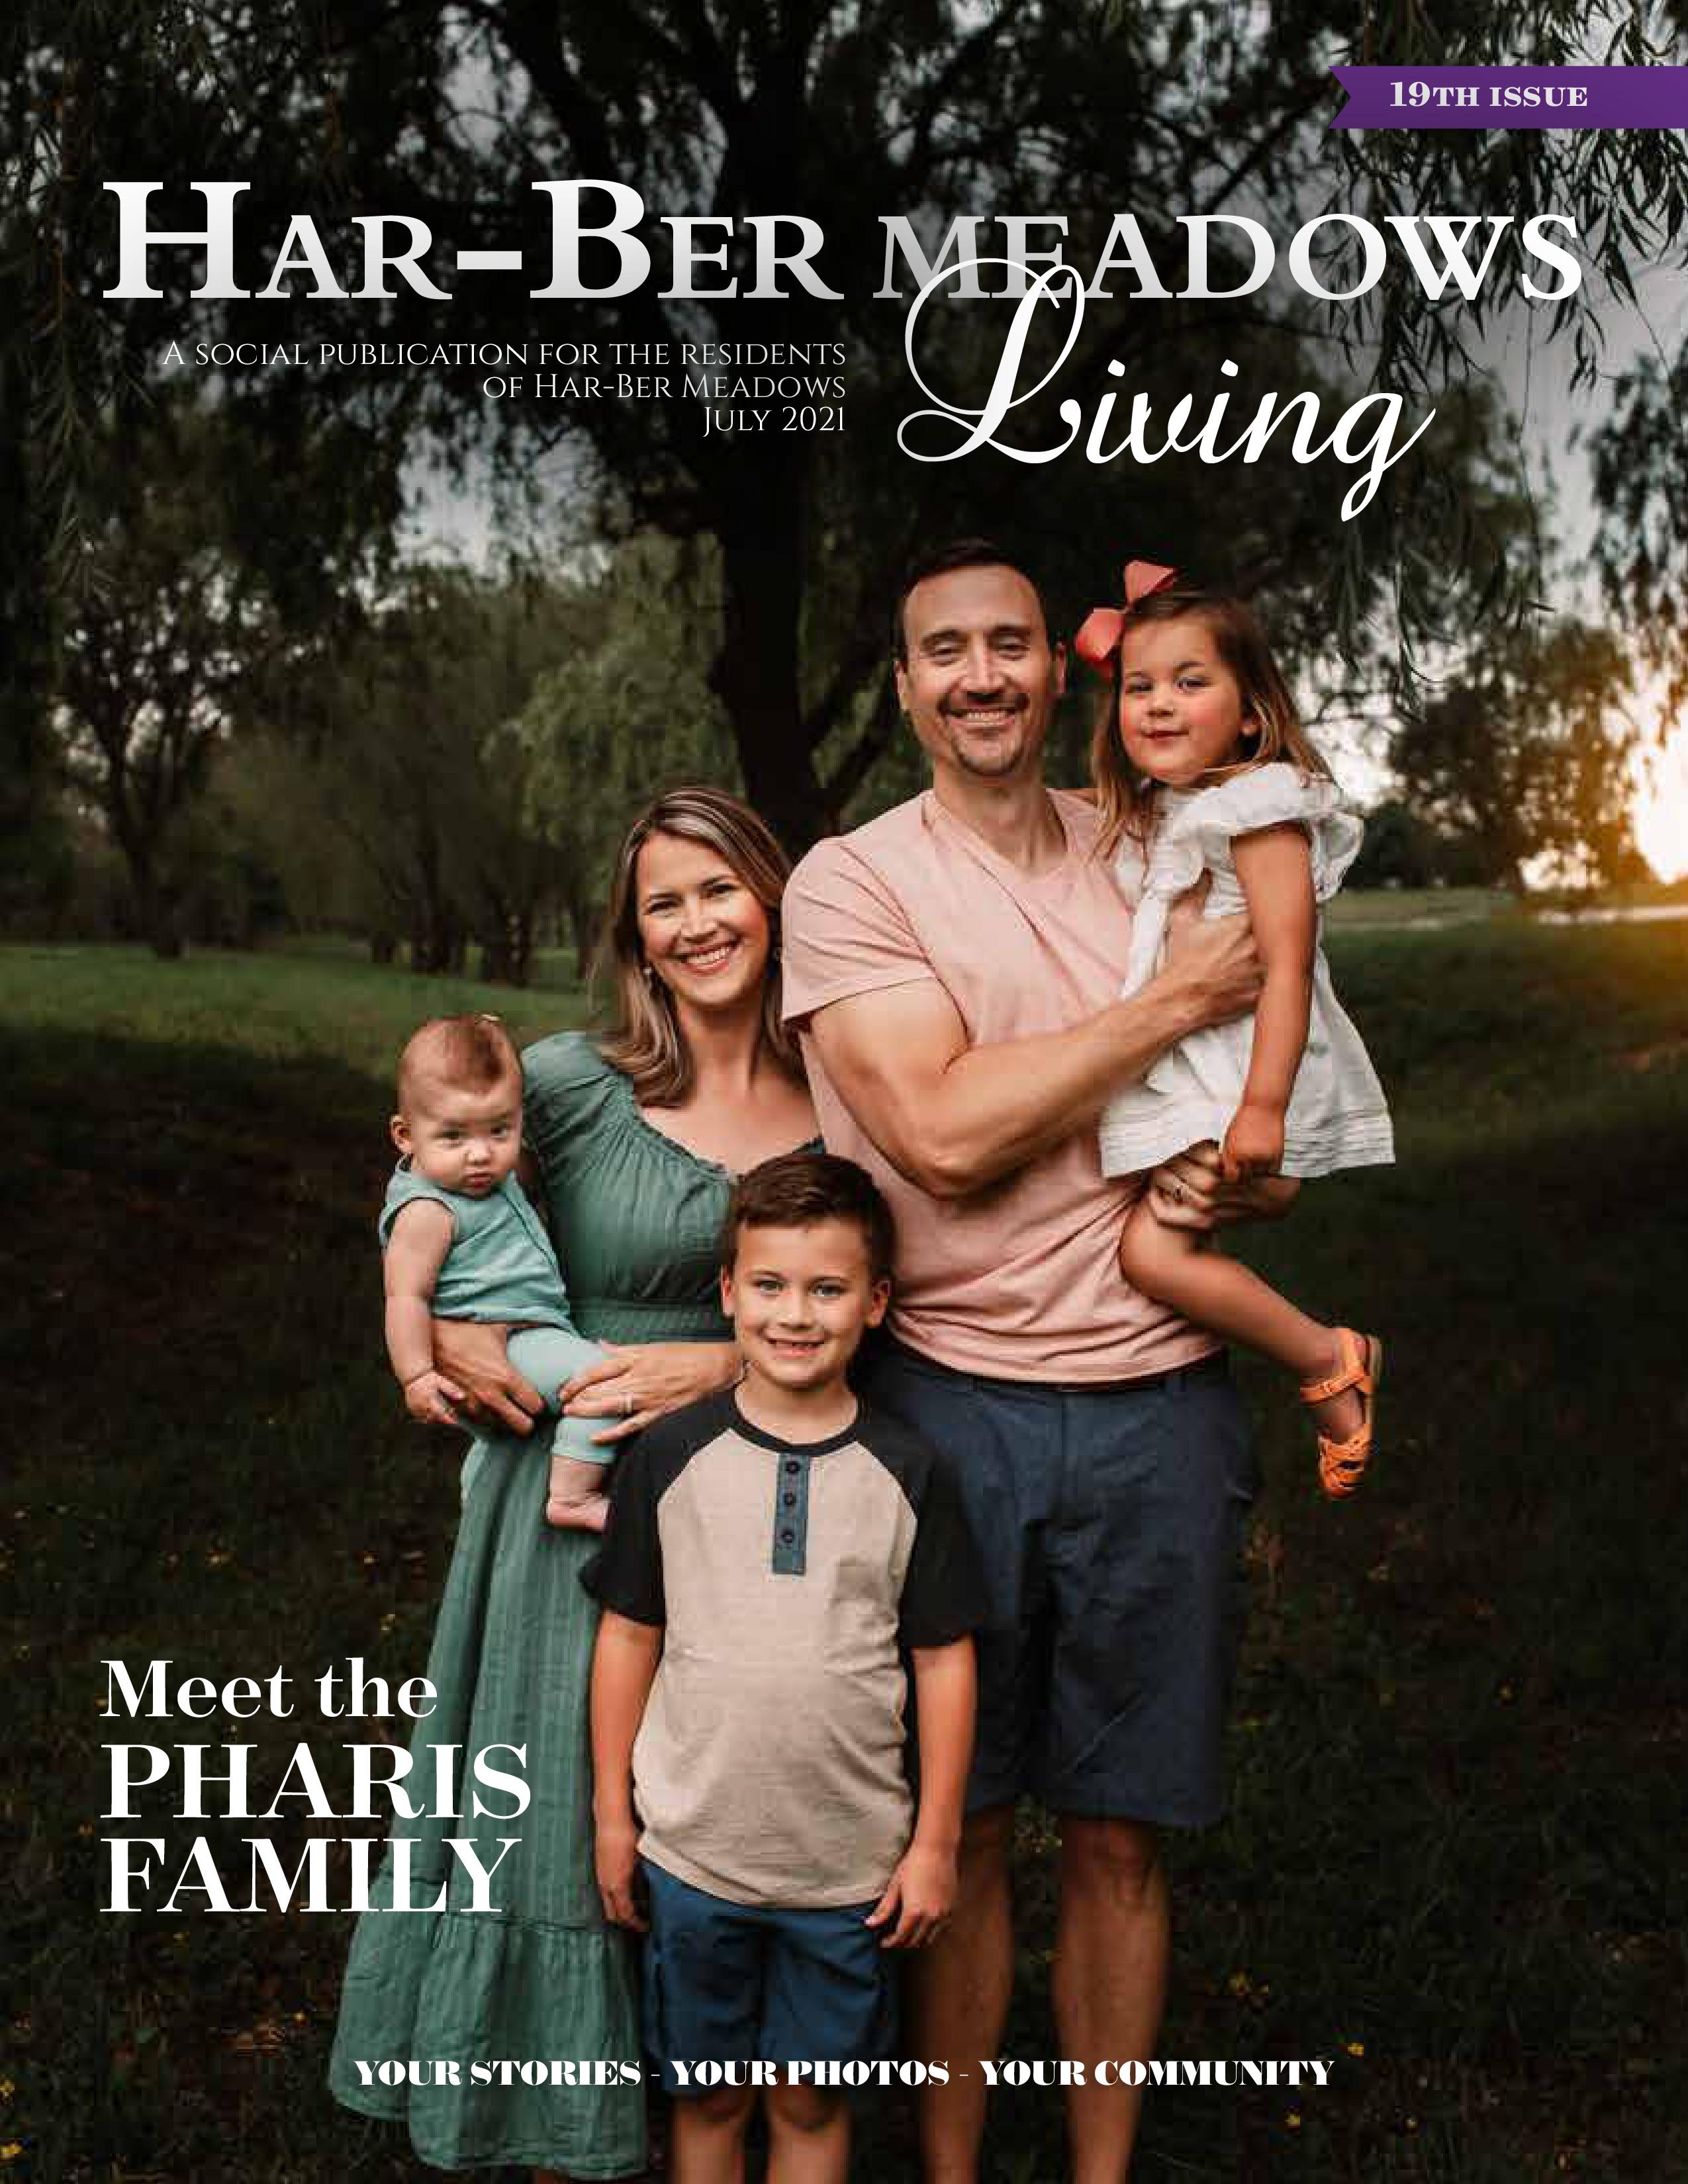 Har-Ber Meadows Living 2021-07-01